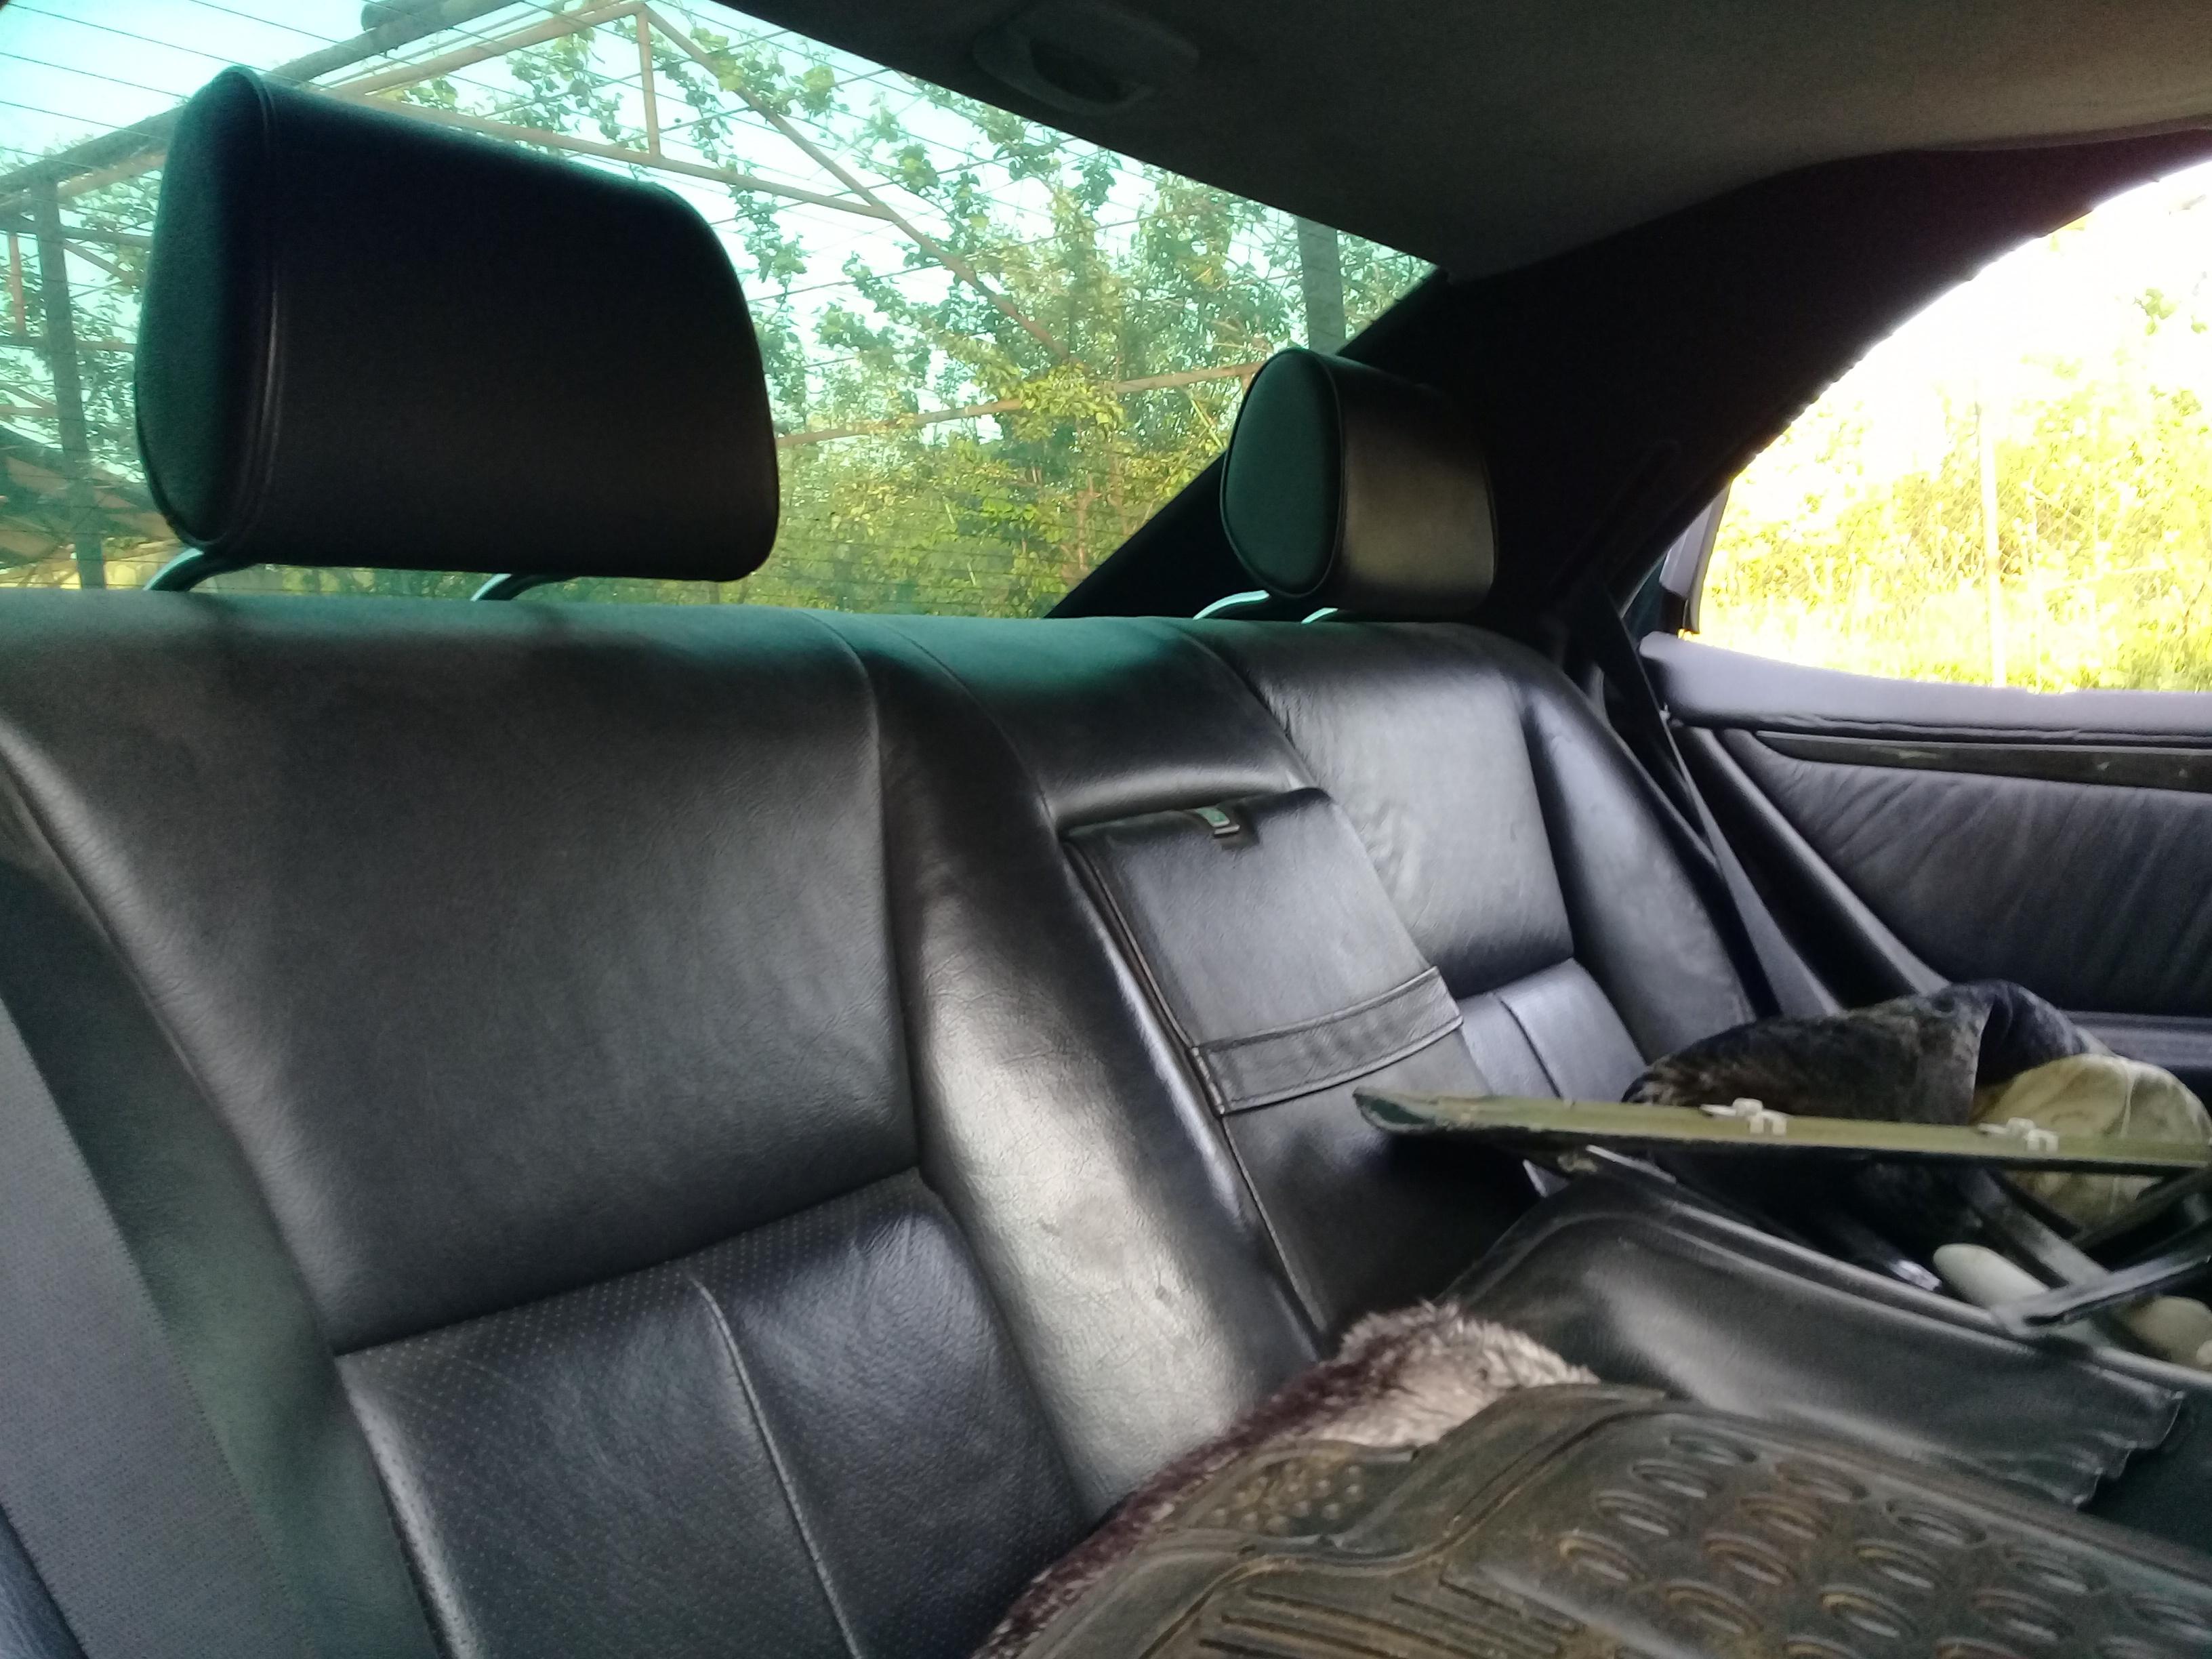 Mercedes-Benz E 230 2.3(lt) 1997 İkinci əl  $5000